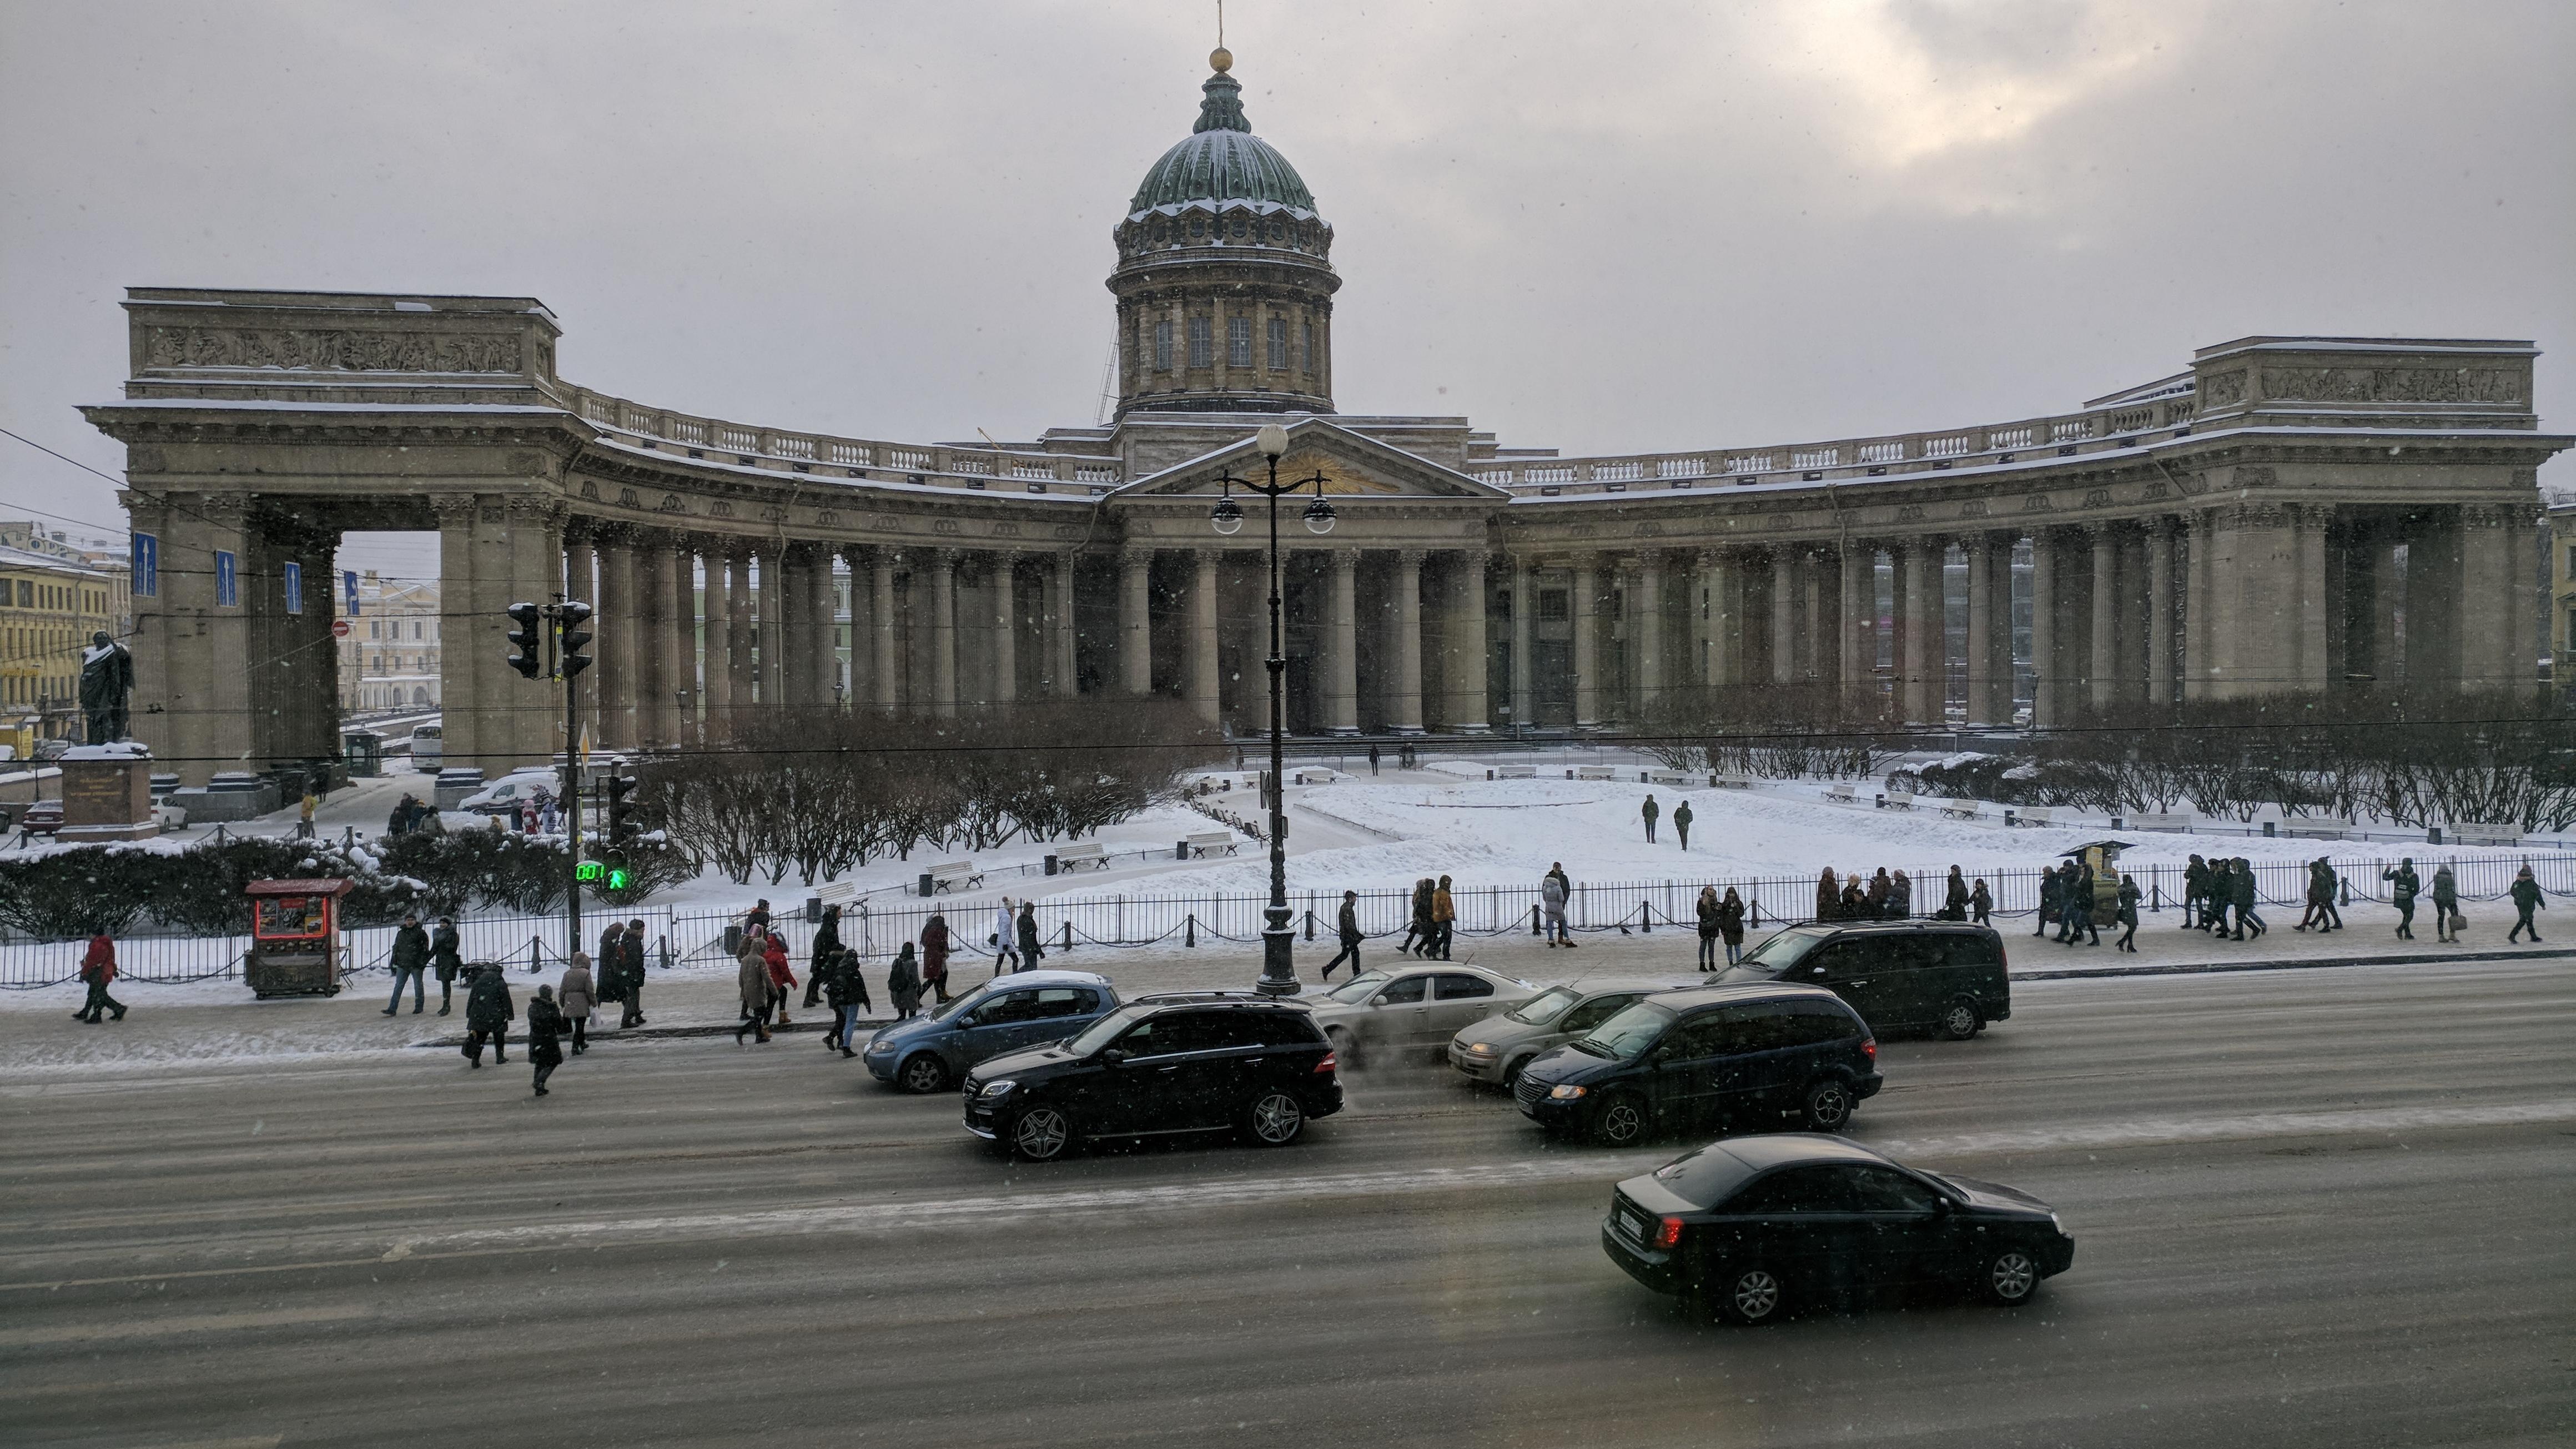 Tourist place kazan cathedral in saint petersburg russia 4k wallpaper hd wallpapers - 4k wallpaper russia ...